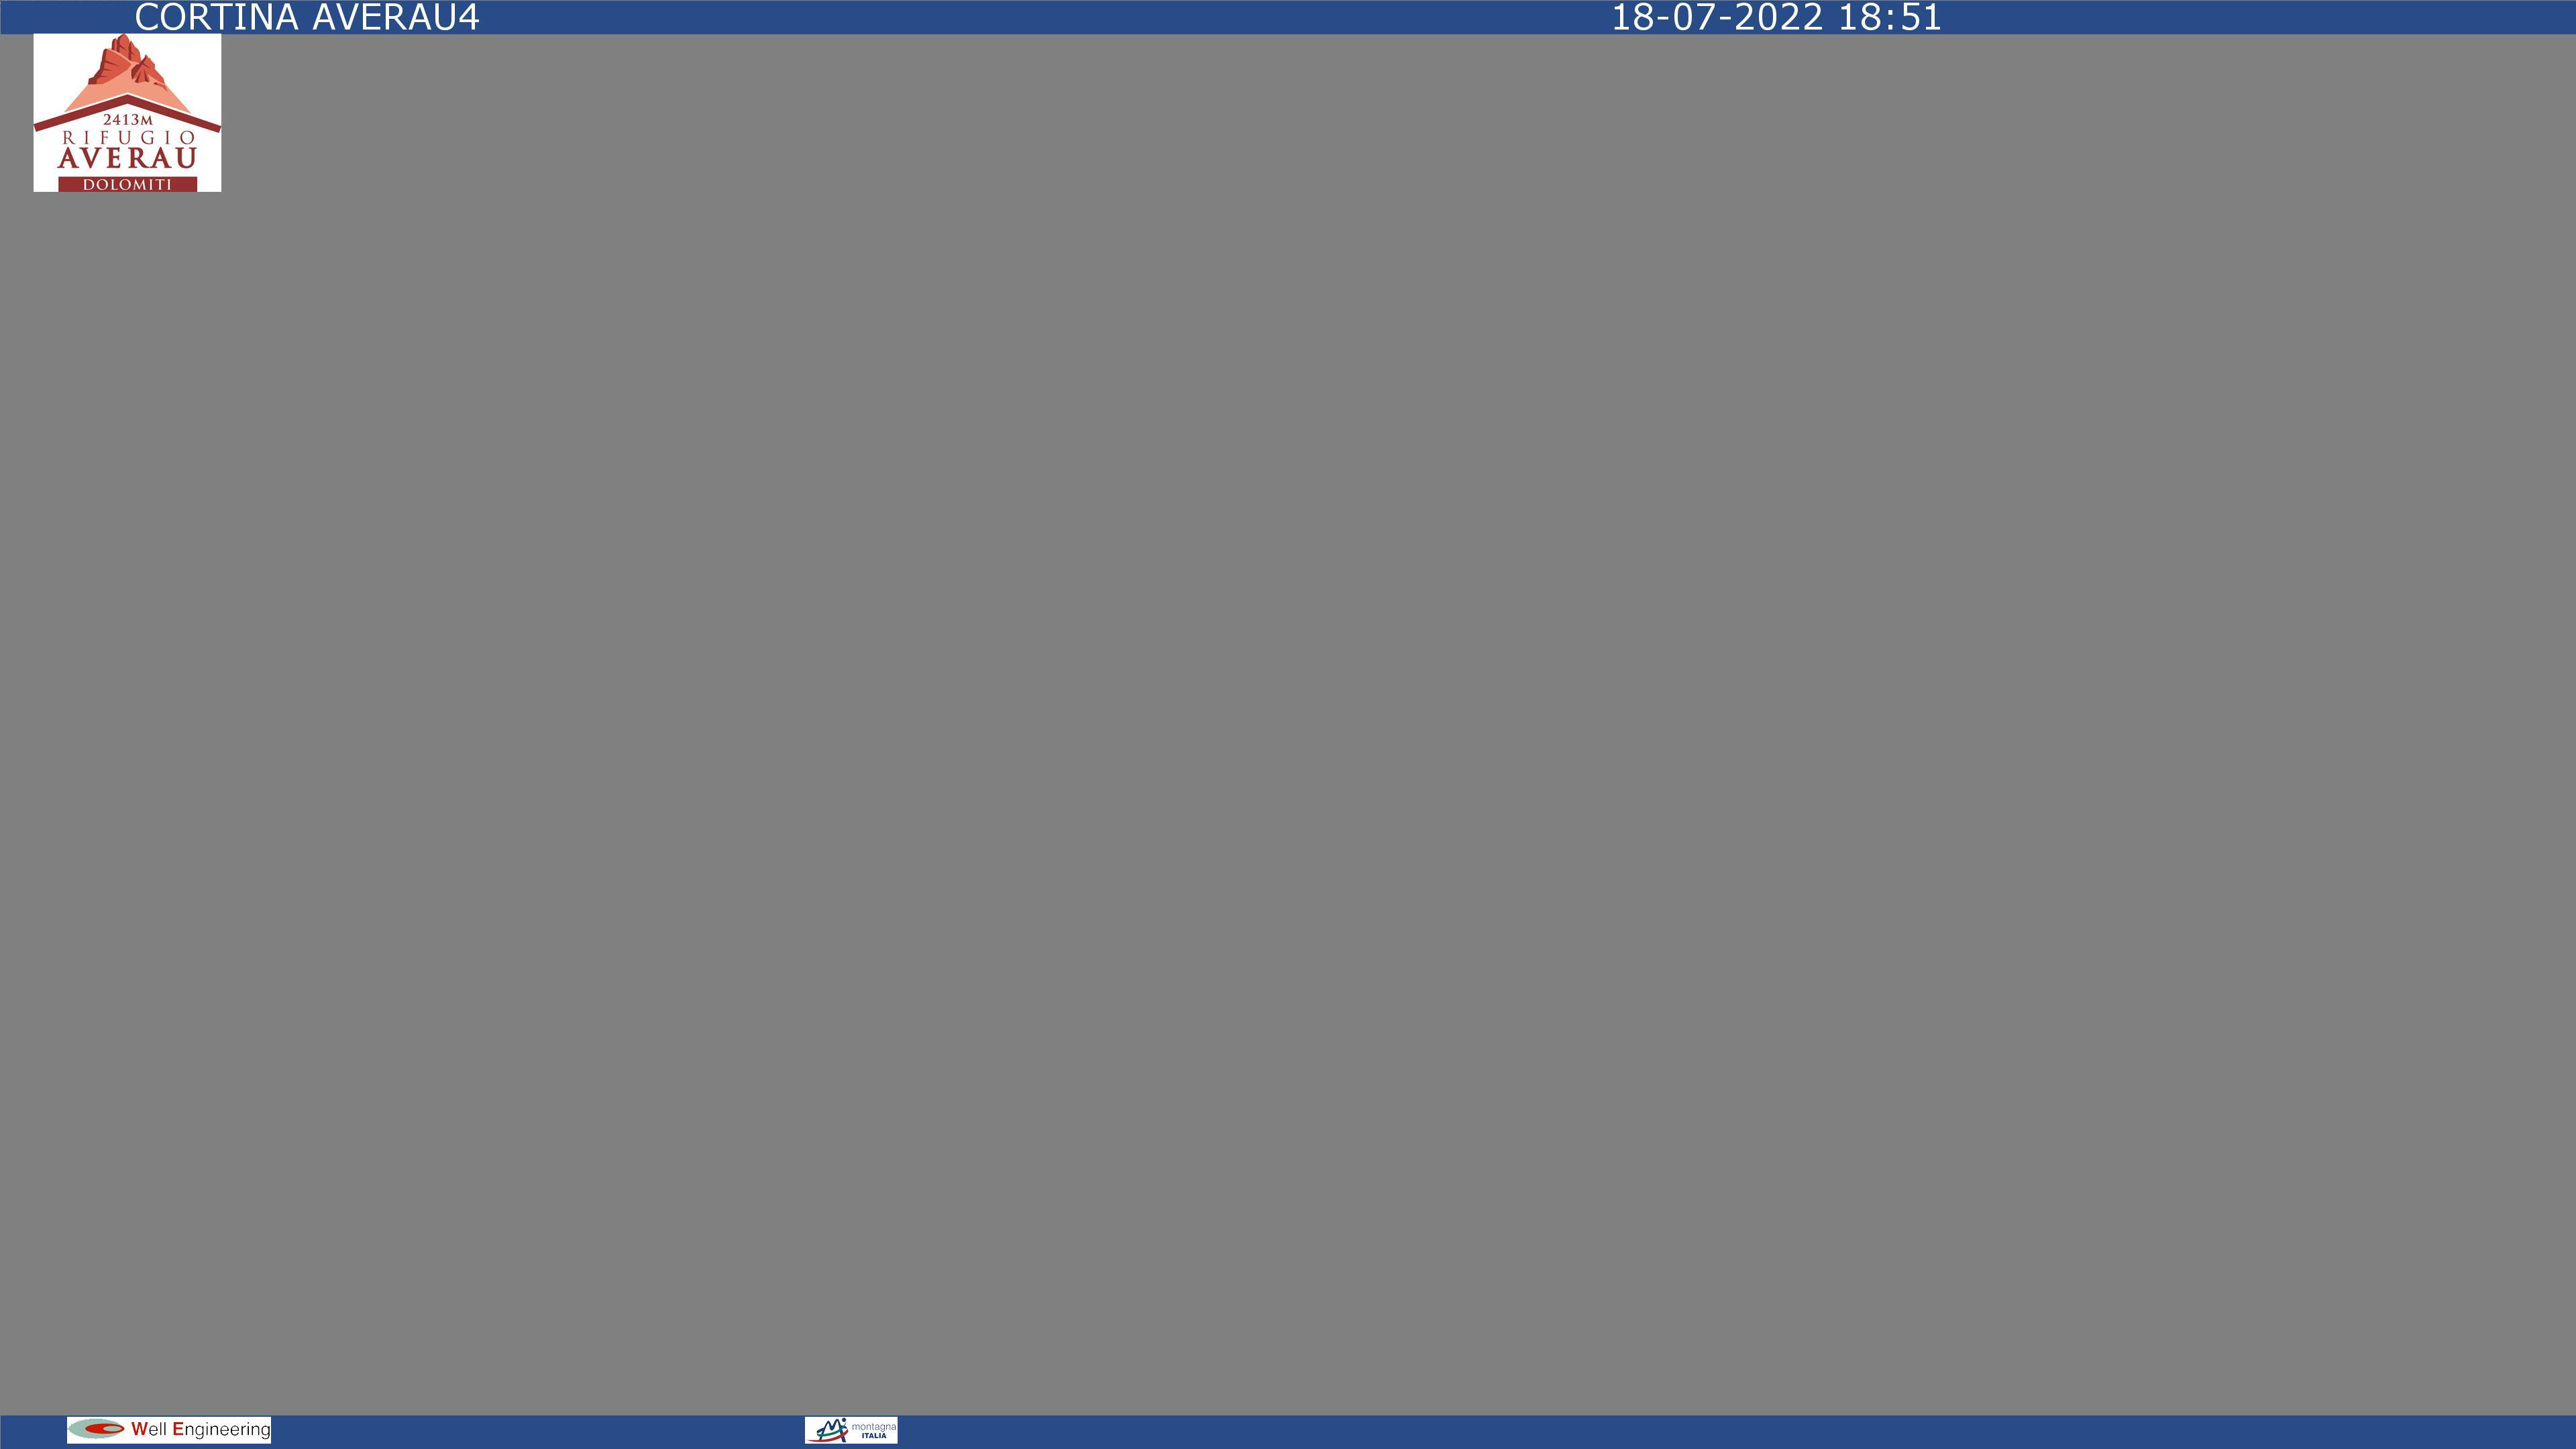 Dal rifugio Duca d'Aosta, panorama di Cortina